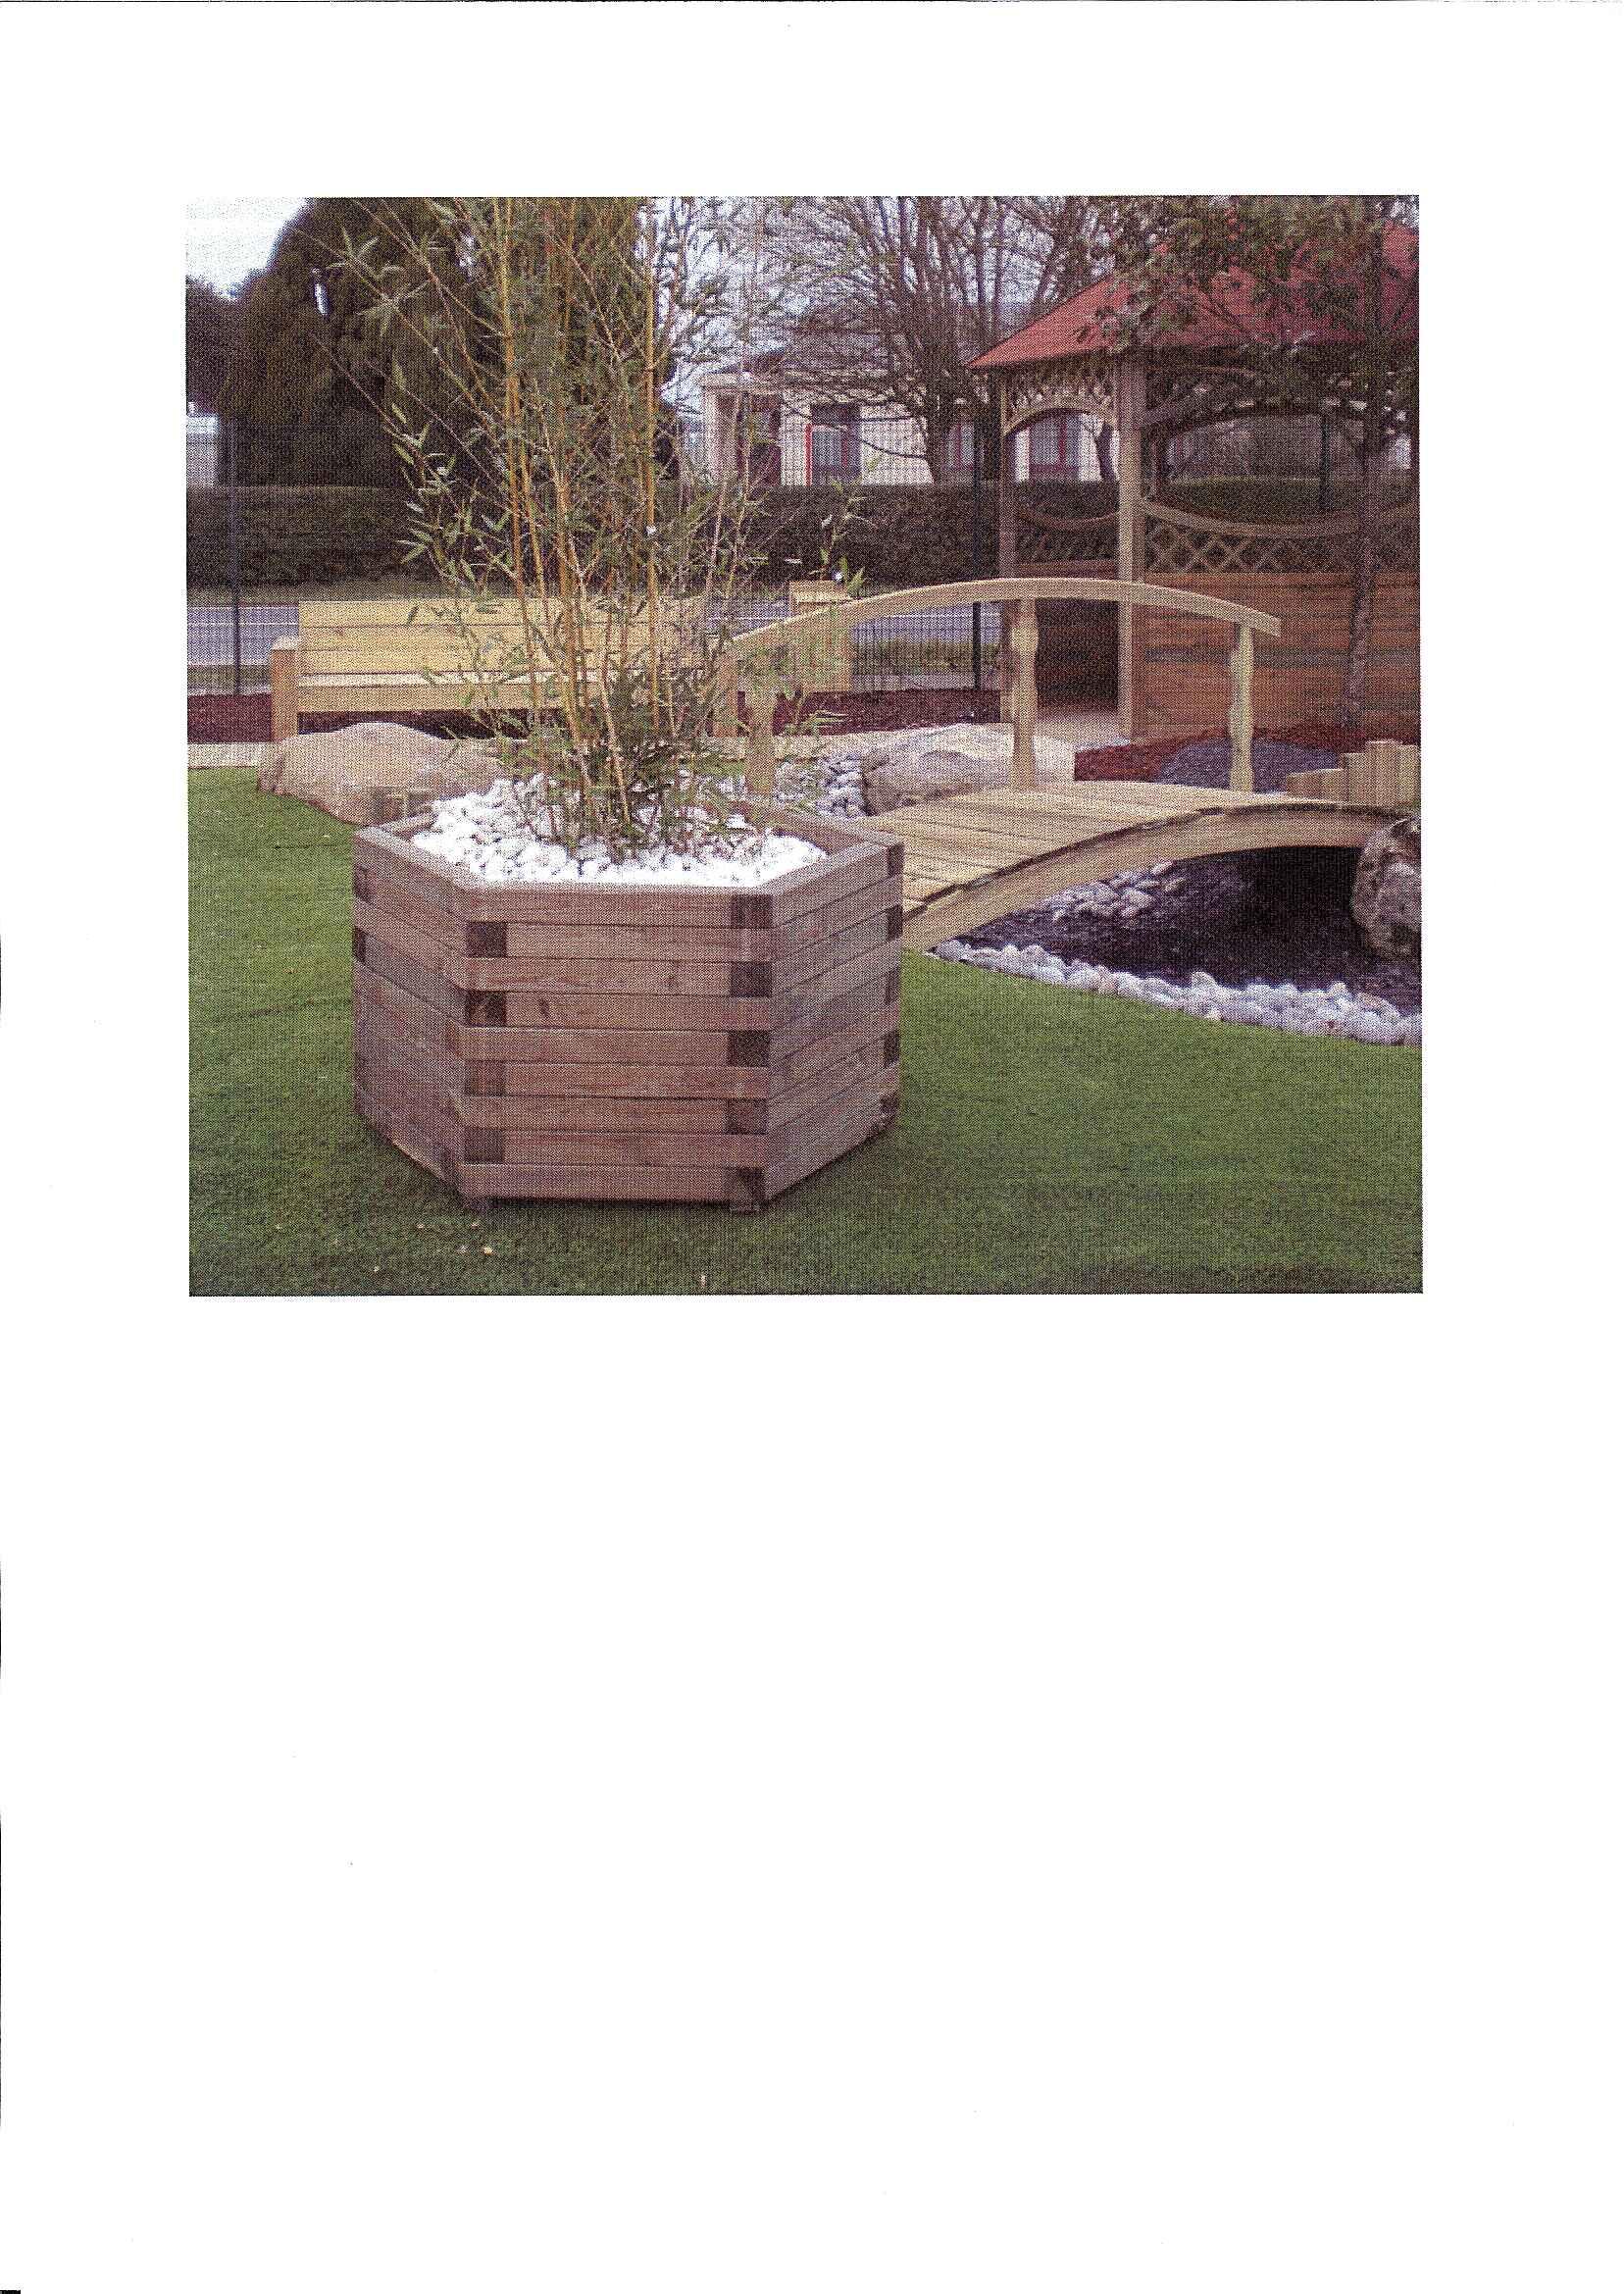 jardiniere patio bois. Black Bedroom Furniture Sets. Home Design Ideas